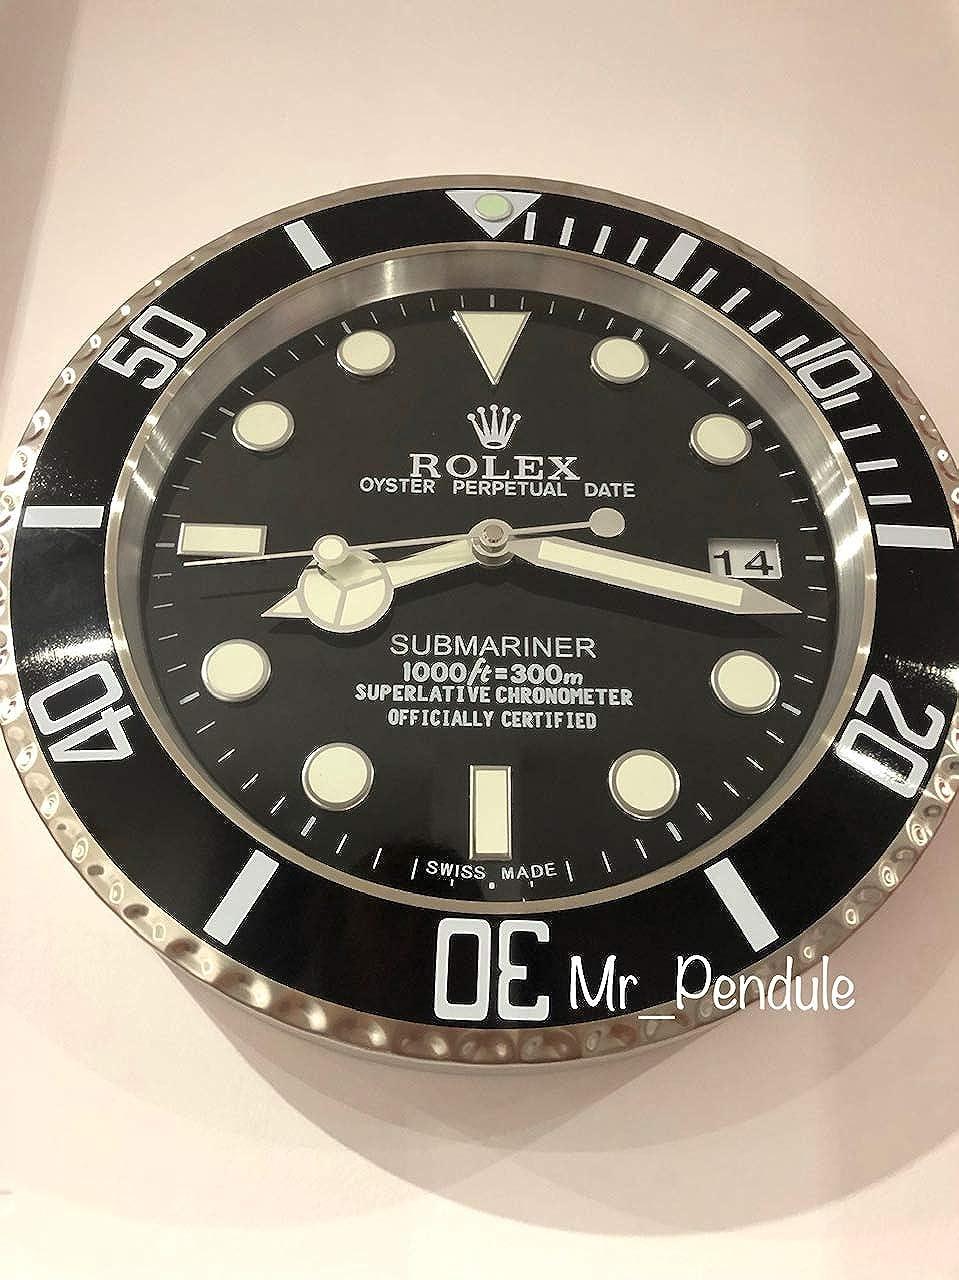 Rolex Replica Rolex Submariner Classic Black Wall Clock: Amazon.co.uk:  Watches